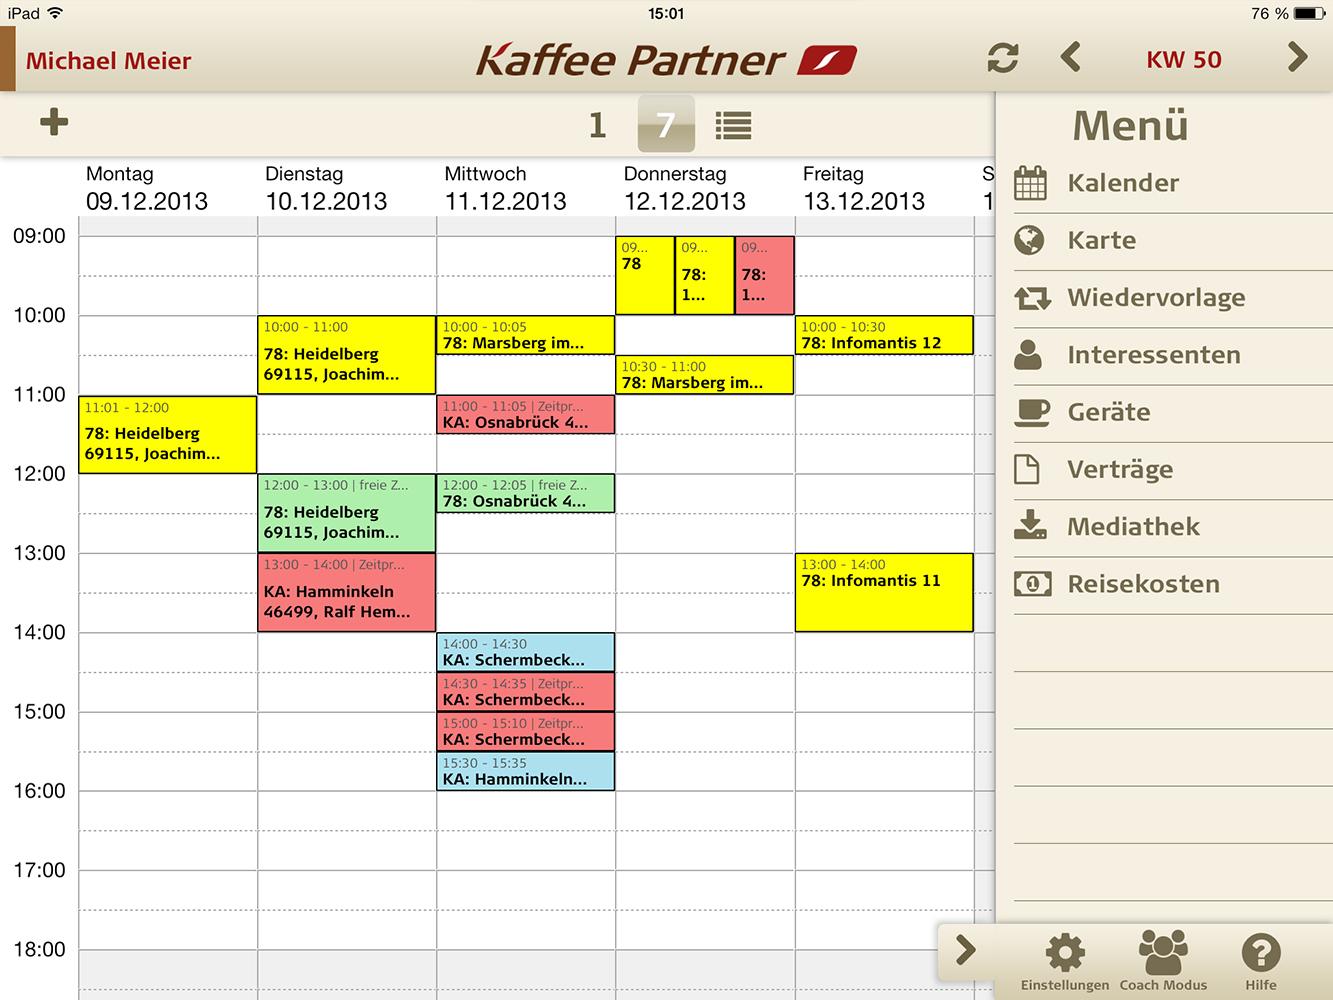 kaffeepartner_menue-und-terminkalender